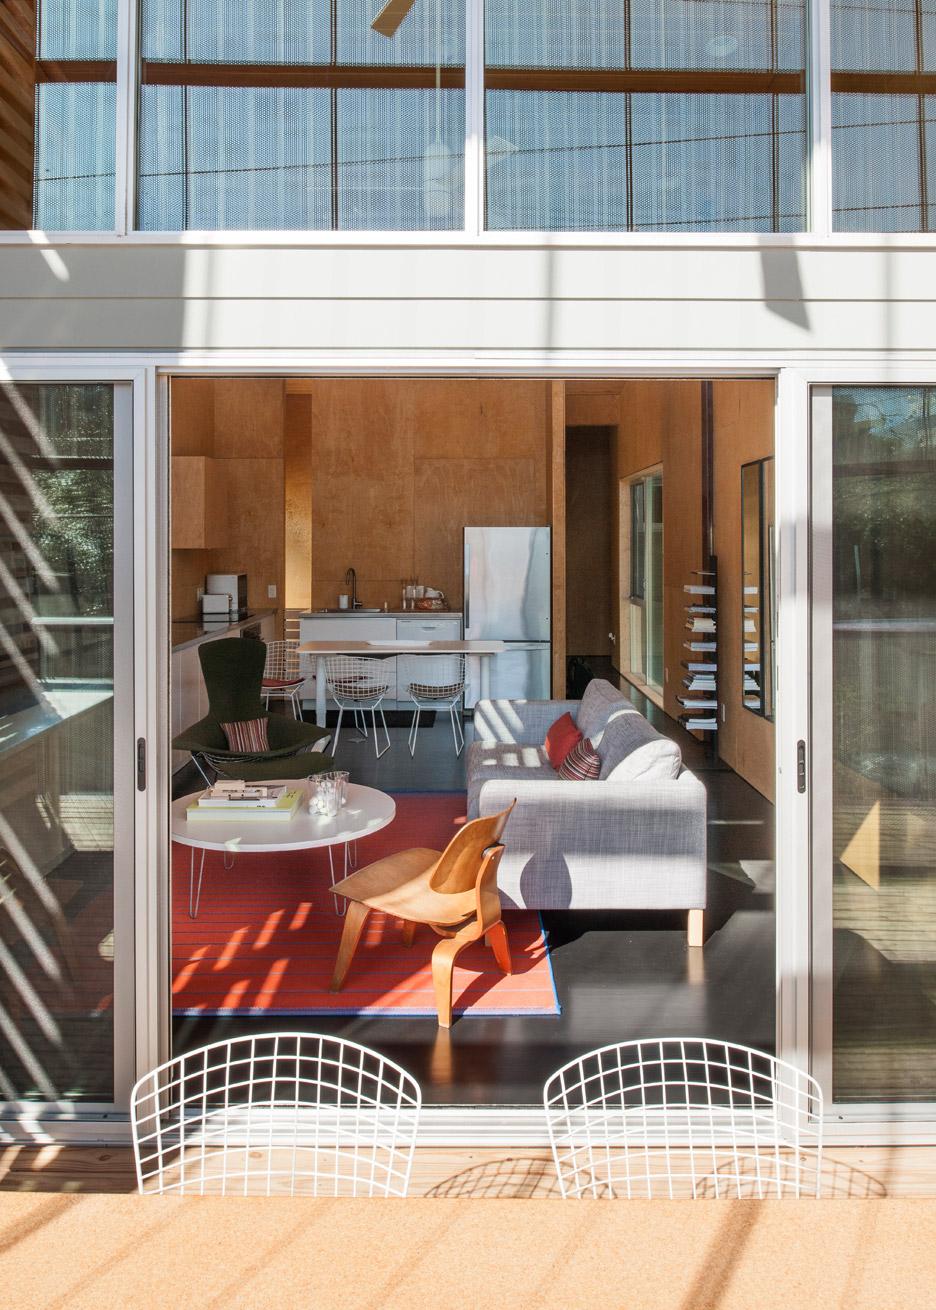 shotgun-chameleon-zdes-sustainable-house-timber-texas_dezeen_936_11